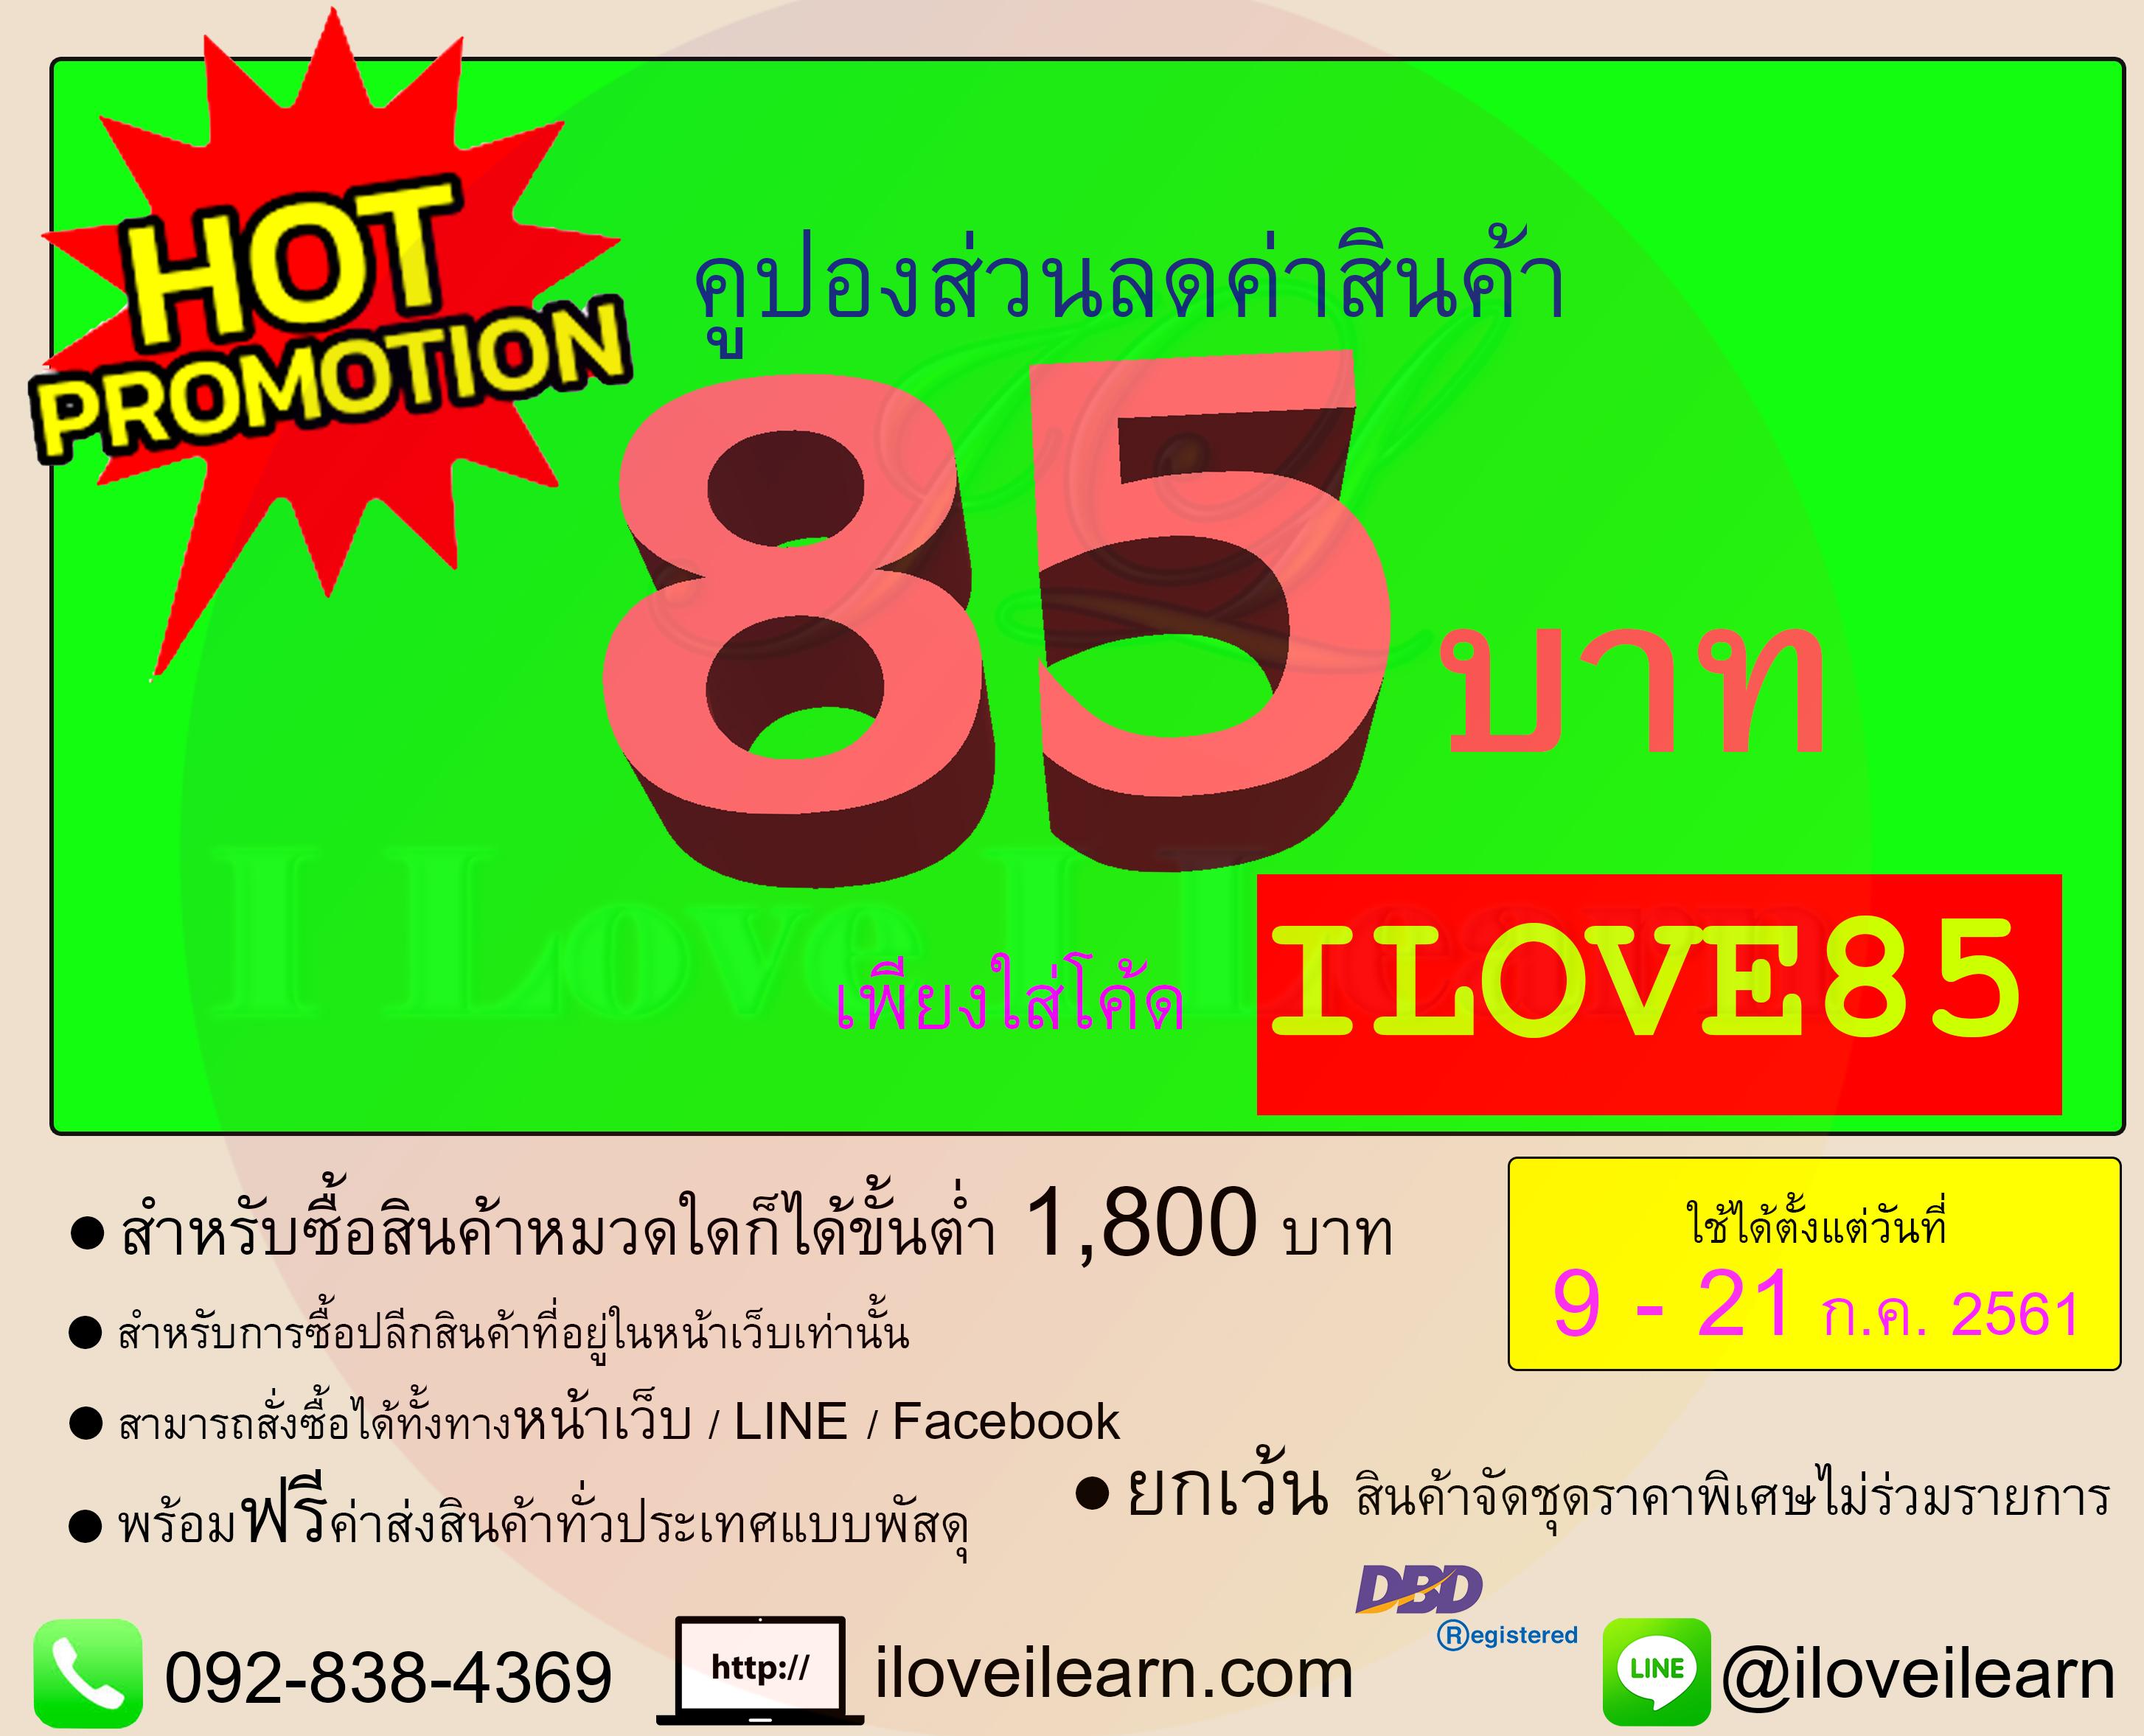 ILOVE85 coupon